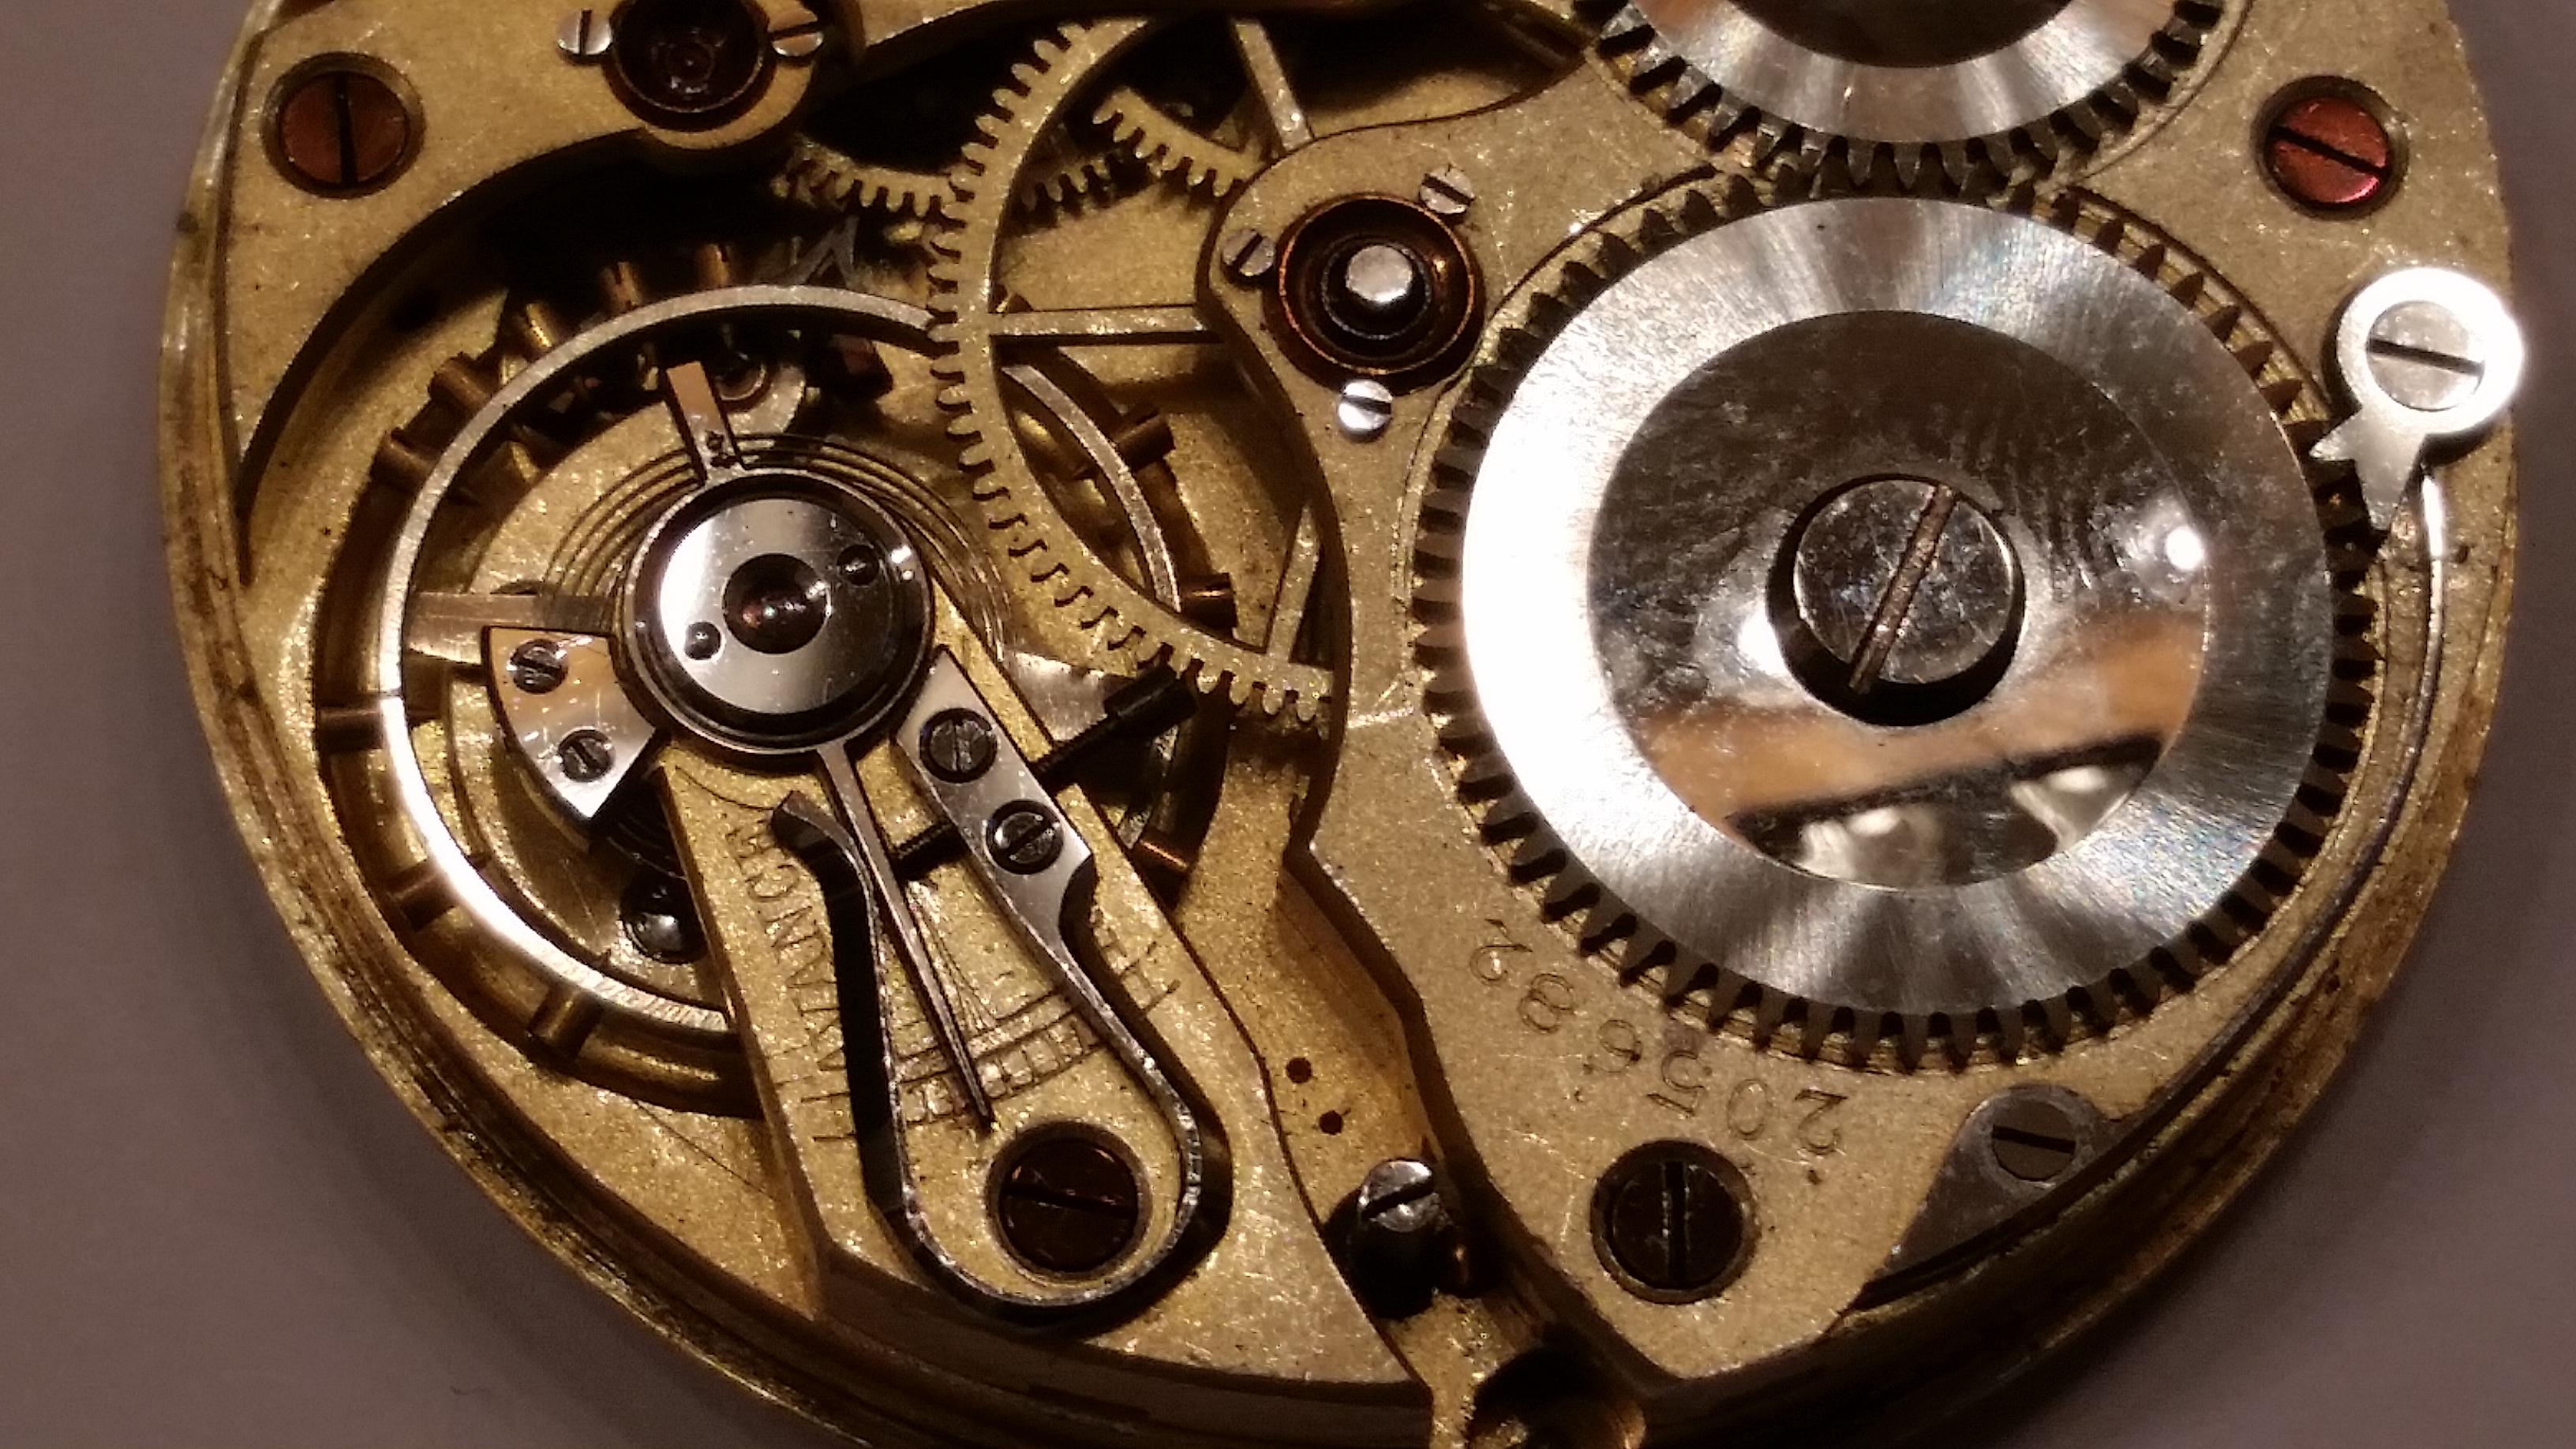 Nomos Glashutte Antique Pocket Watch 1908 Very Rare